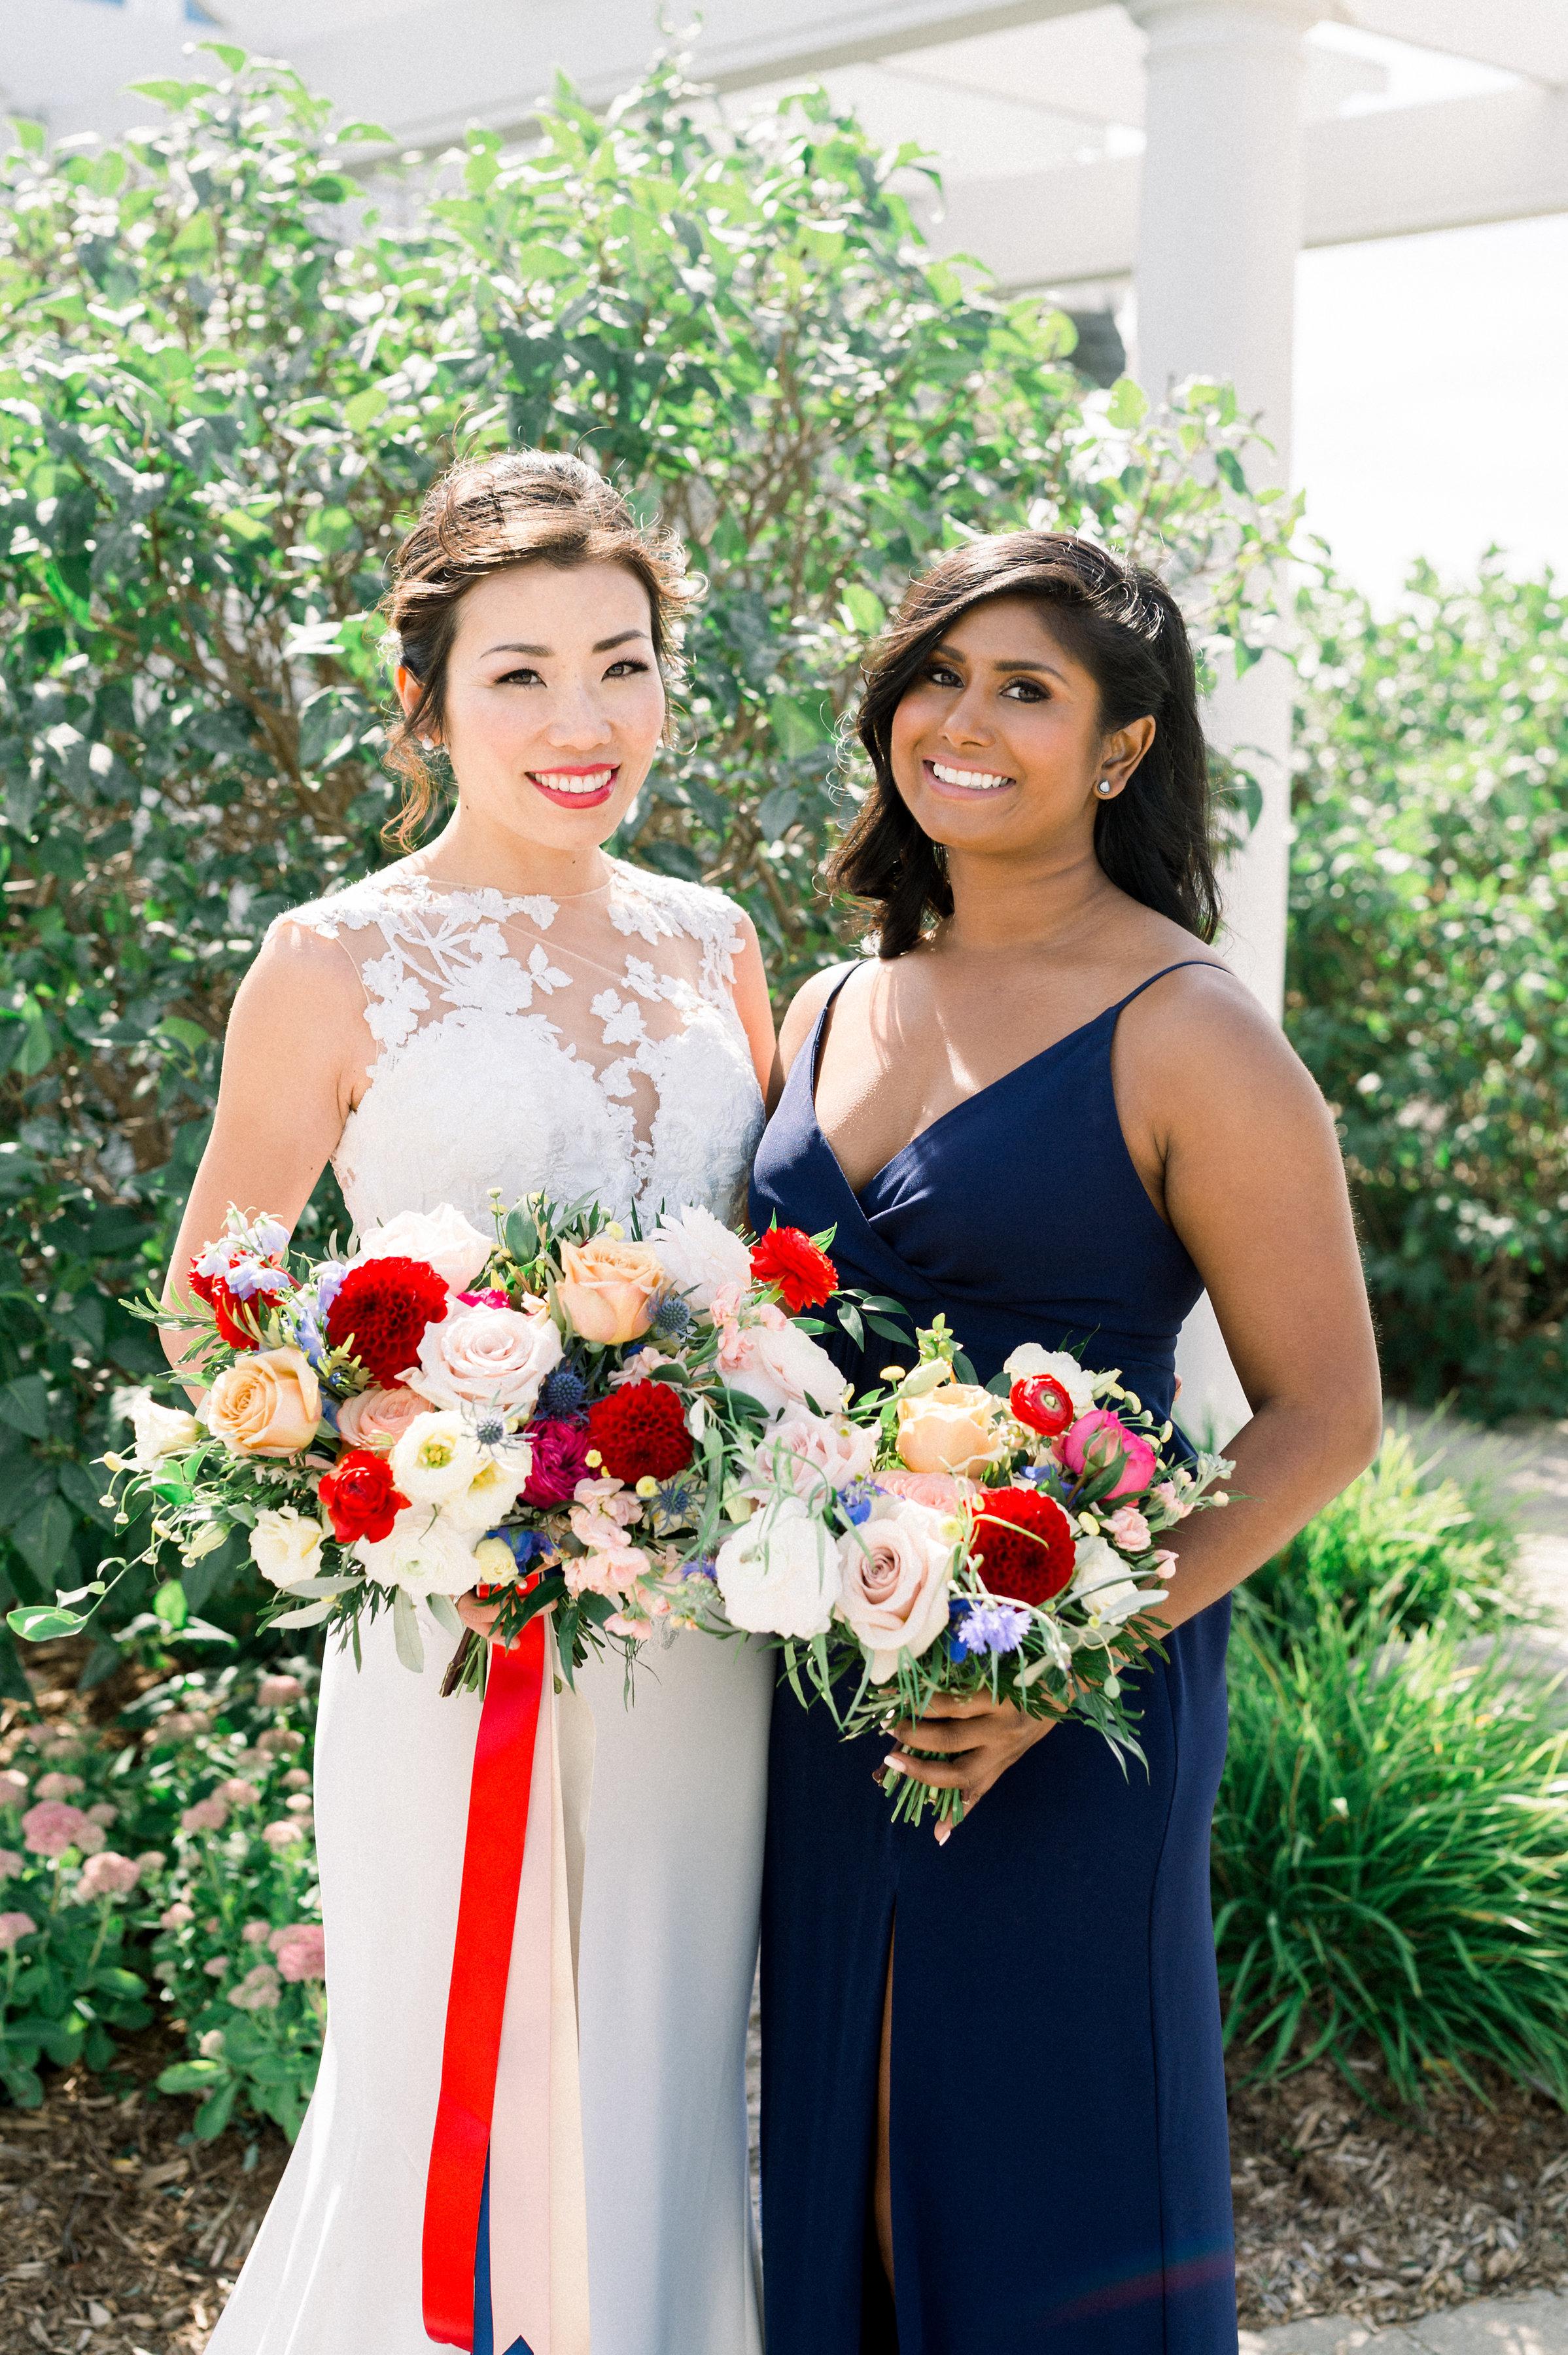 Mamiko-Aaron-Wedding-Whitney-Heard-Photography-5712.jpg